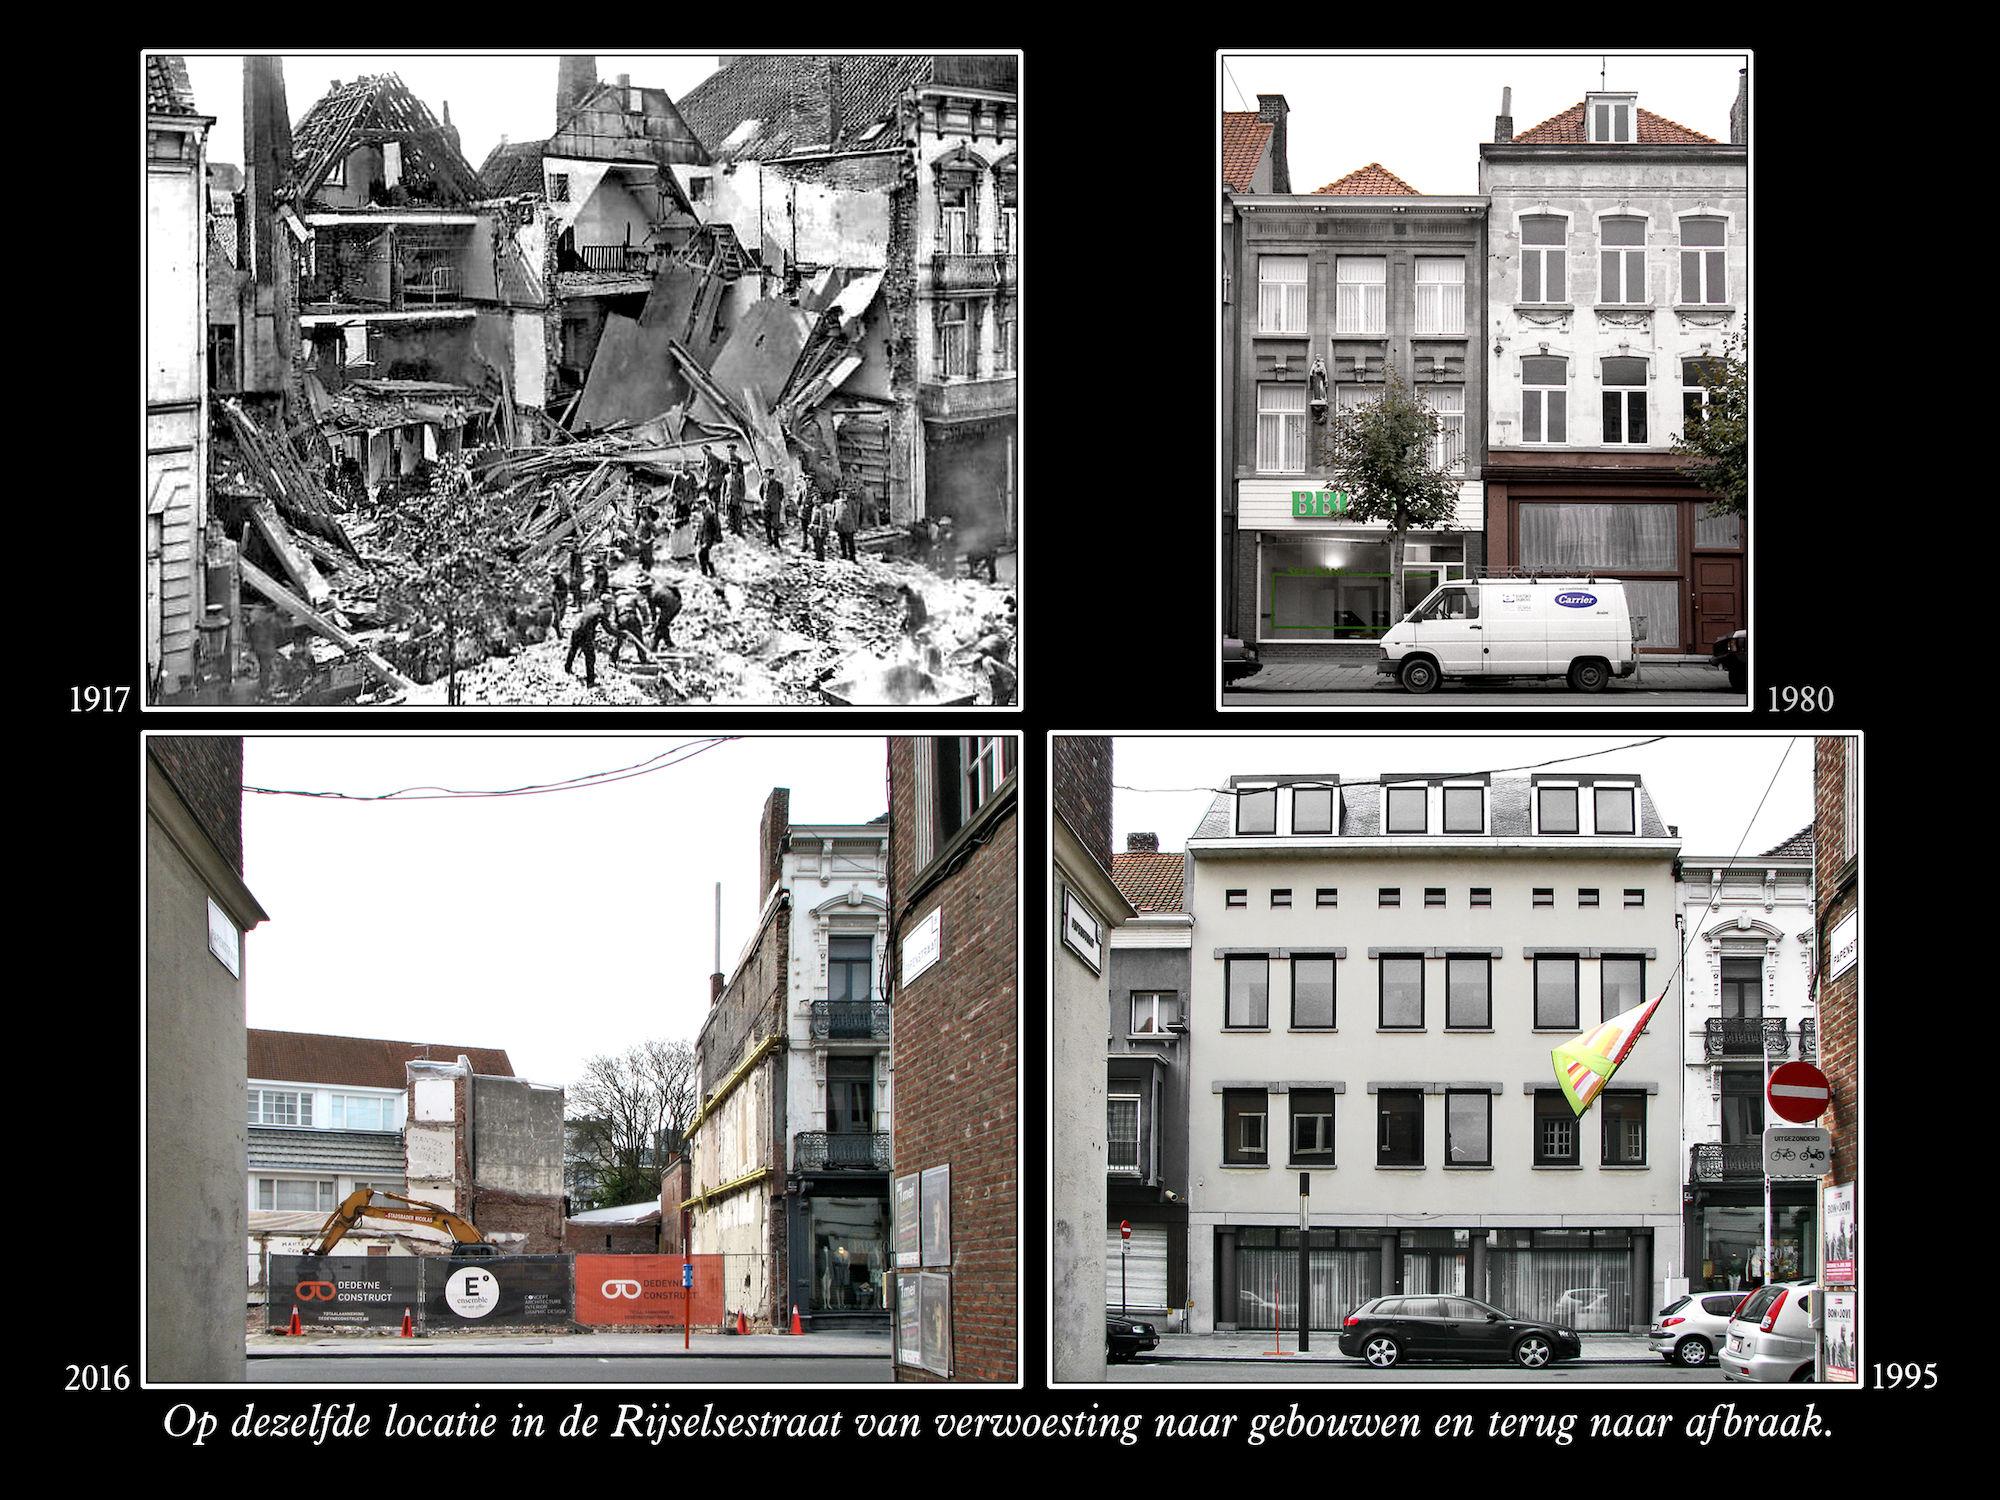 Rijselsestraat 1917-2016